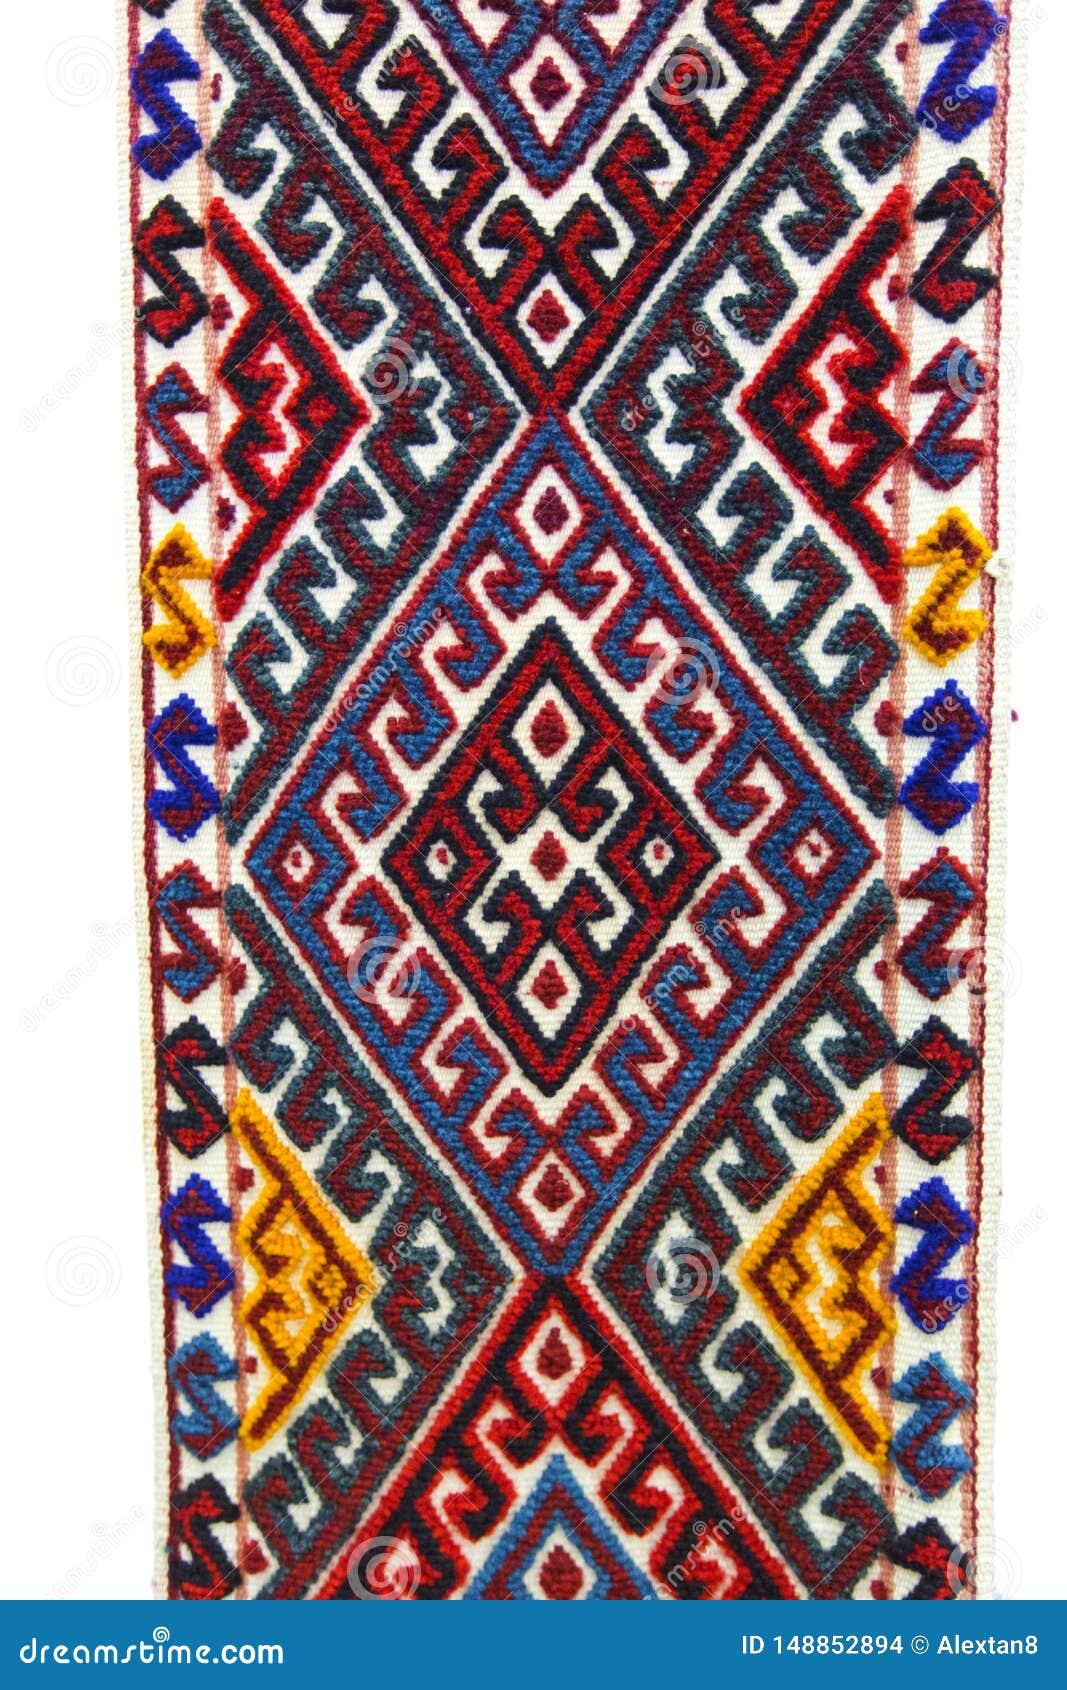 Design art pattern carpet Kazakhstan nomad